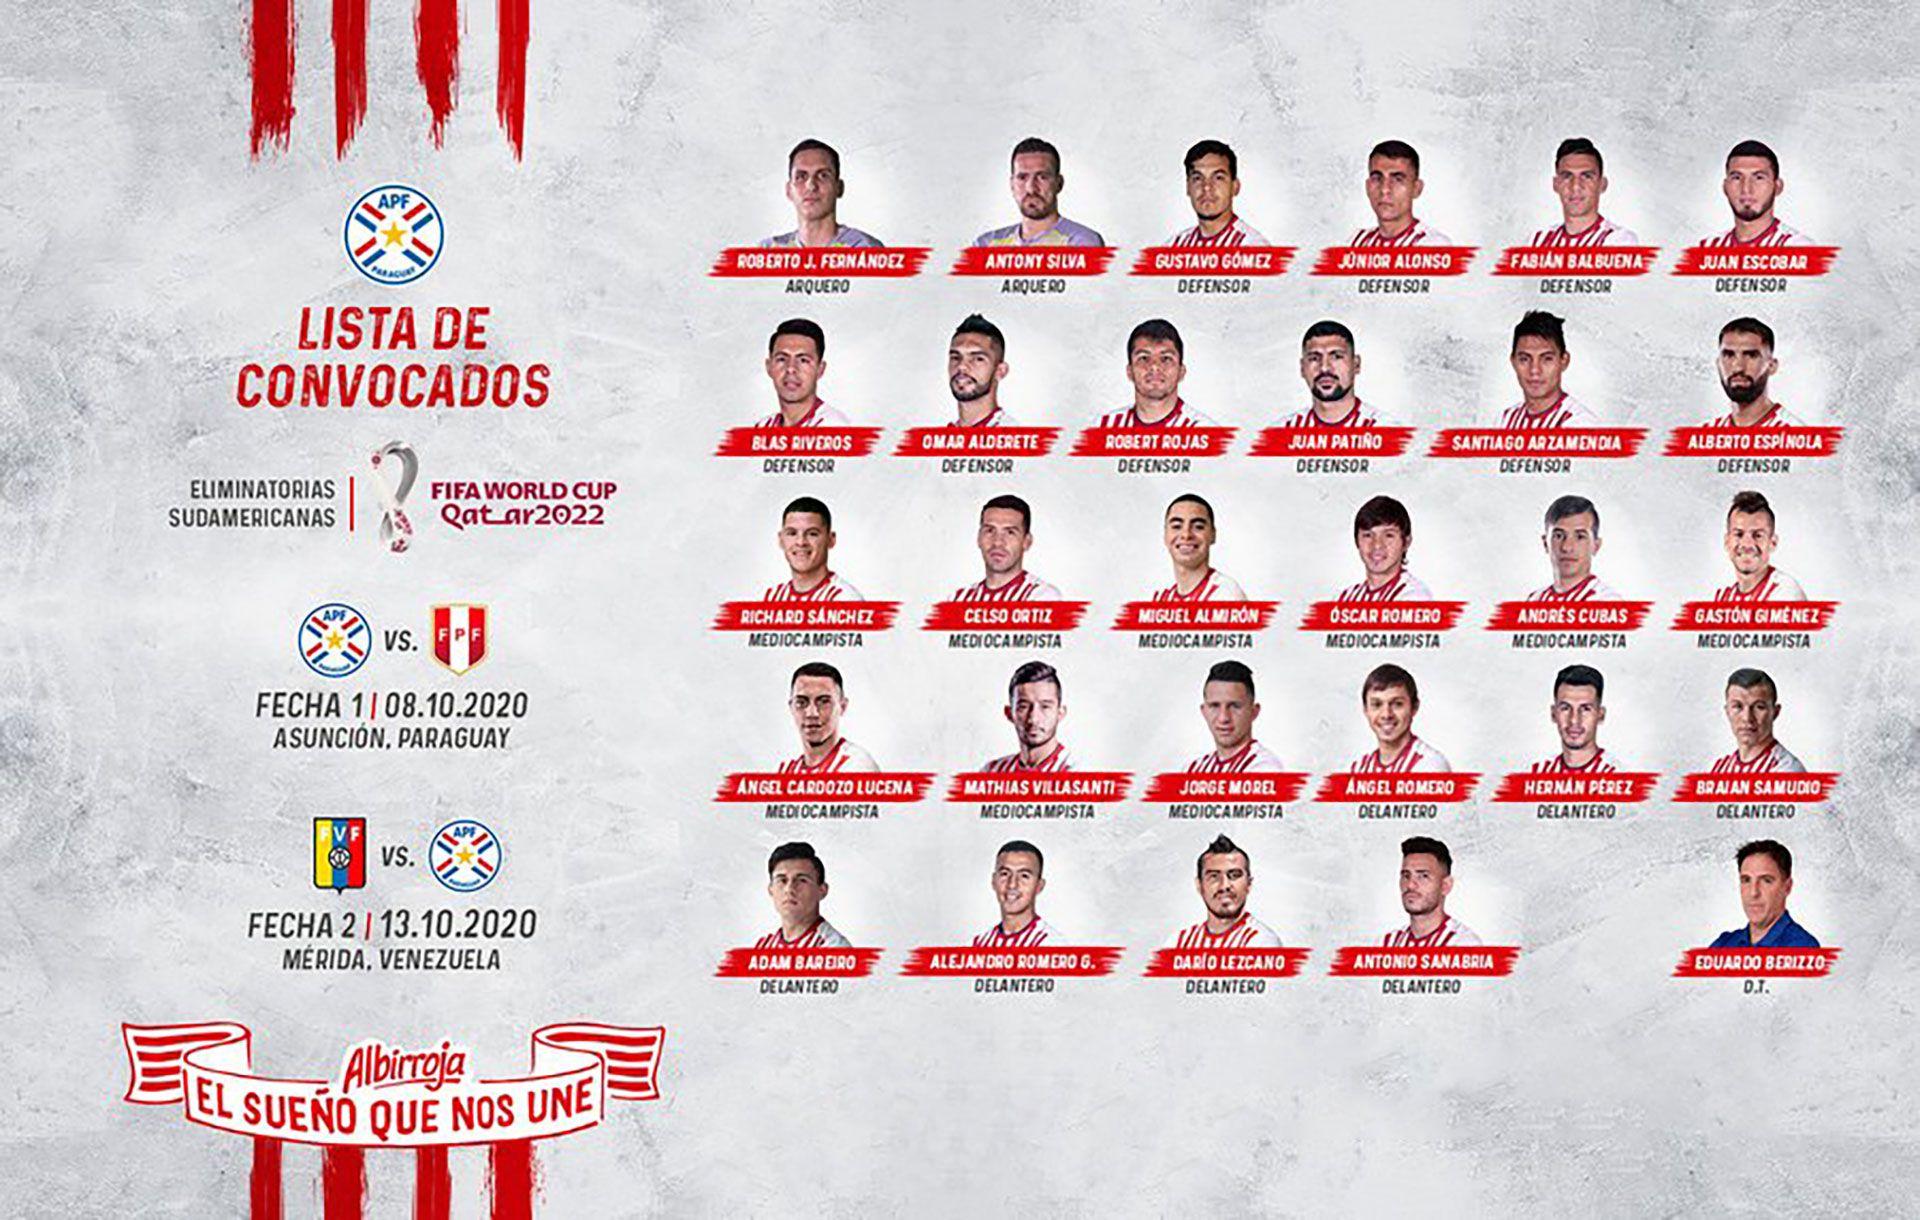 convocados-seleccion-paraguay-eliminatorias